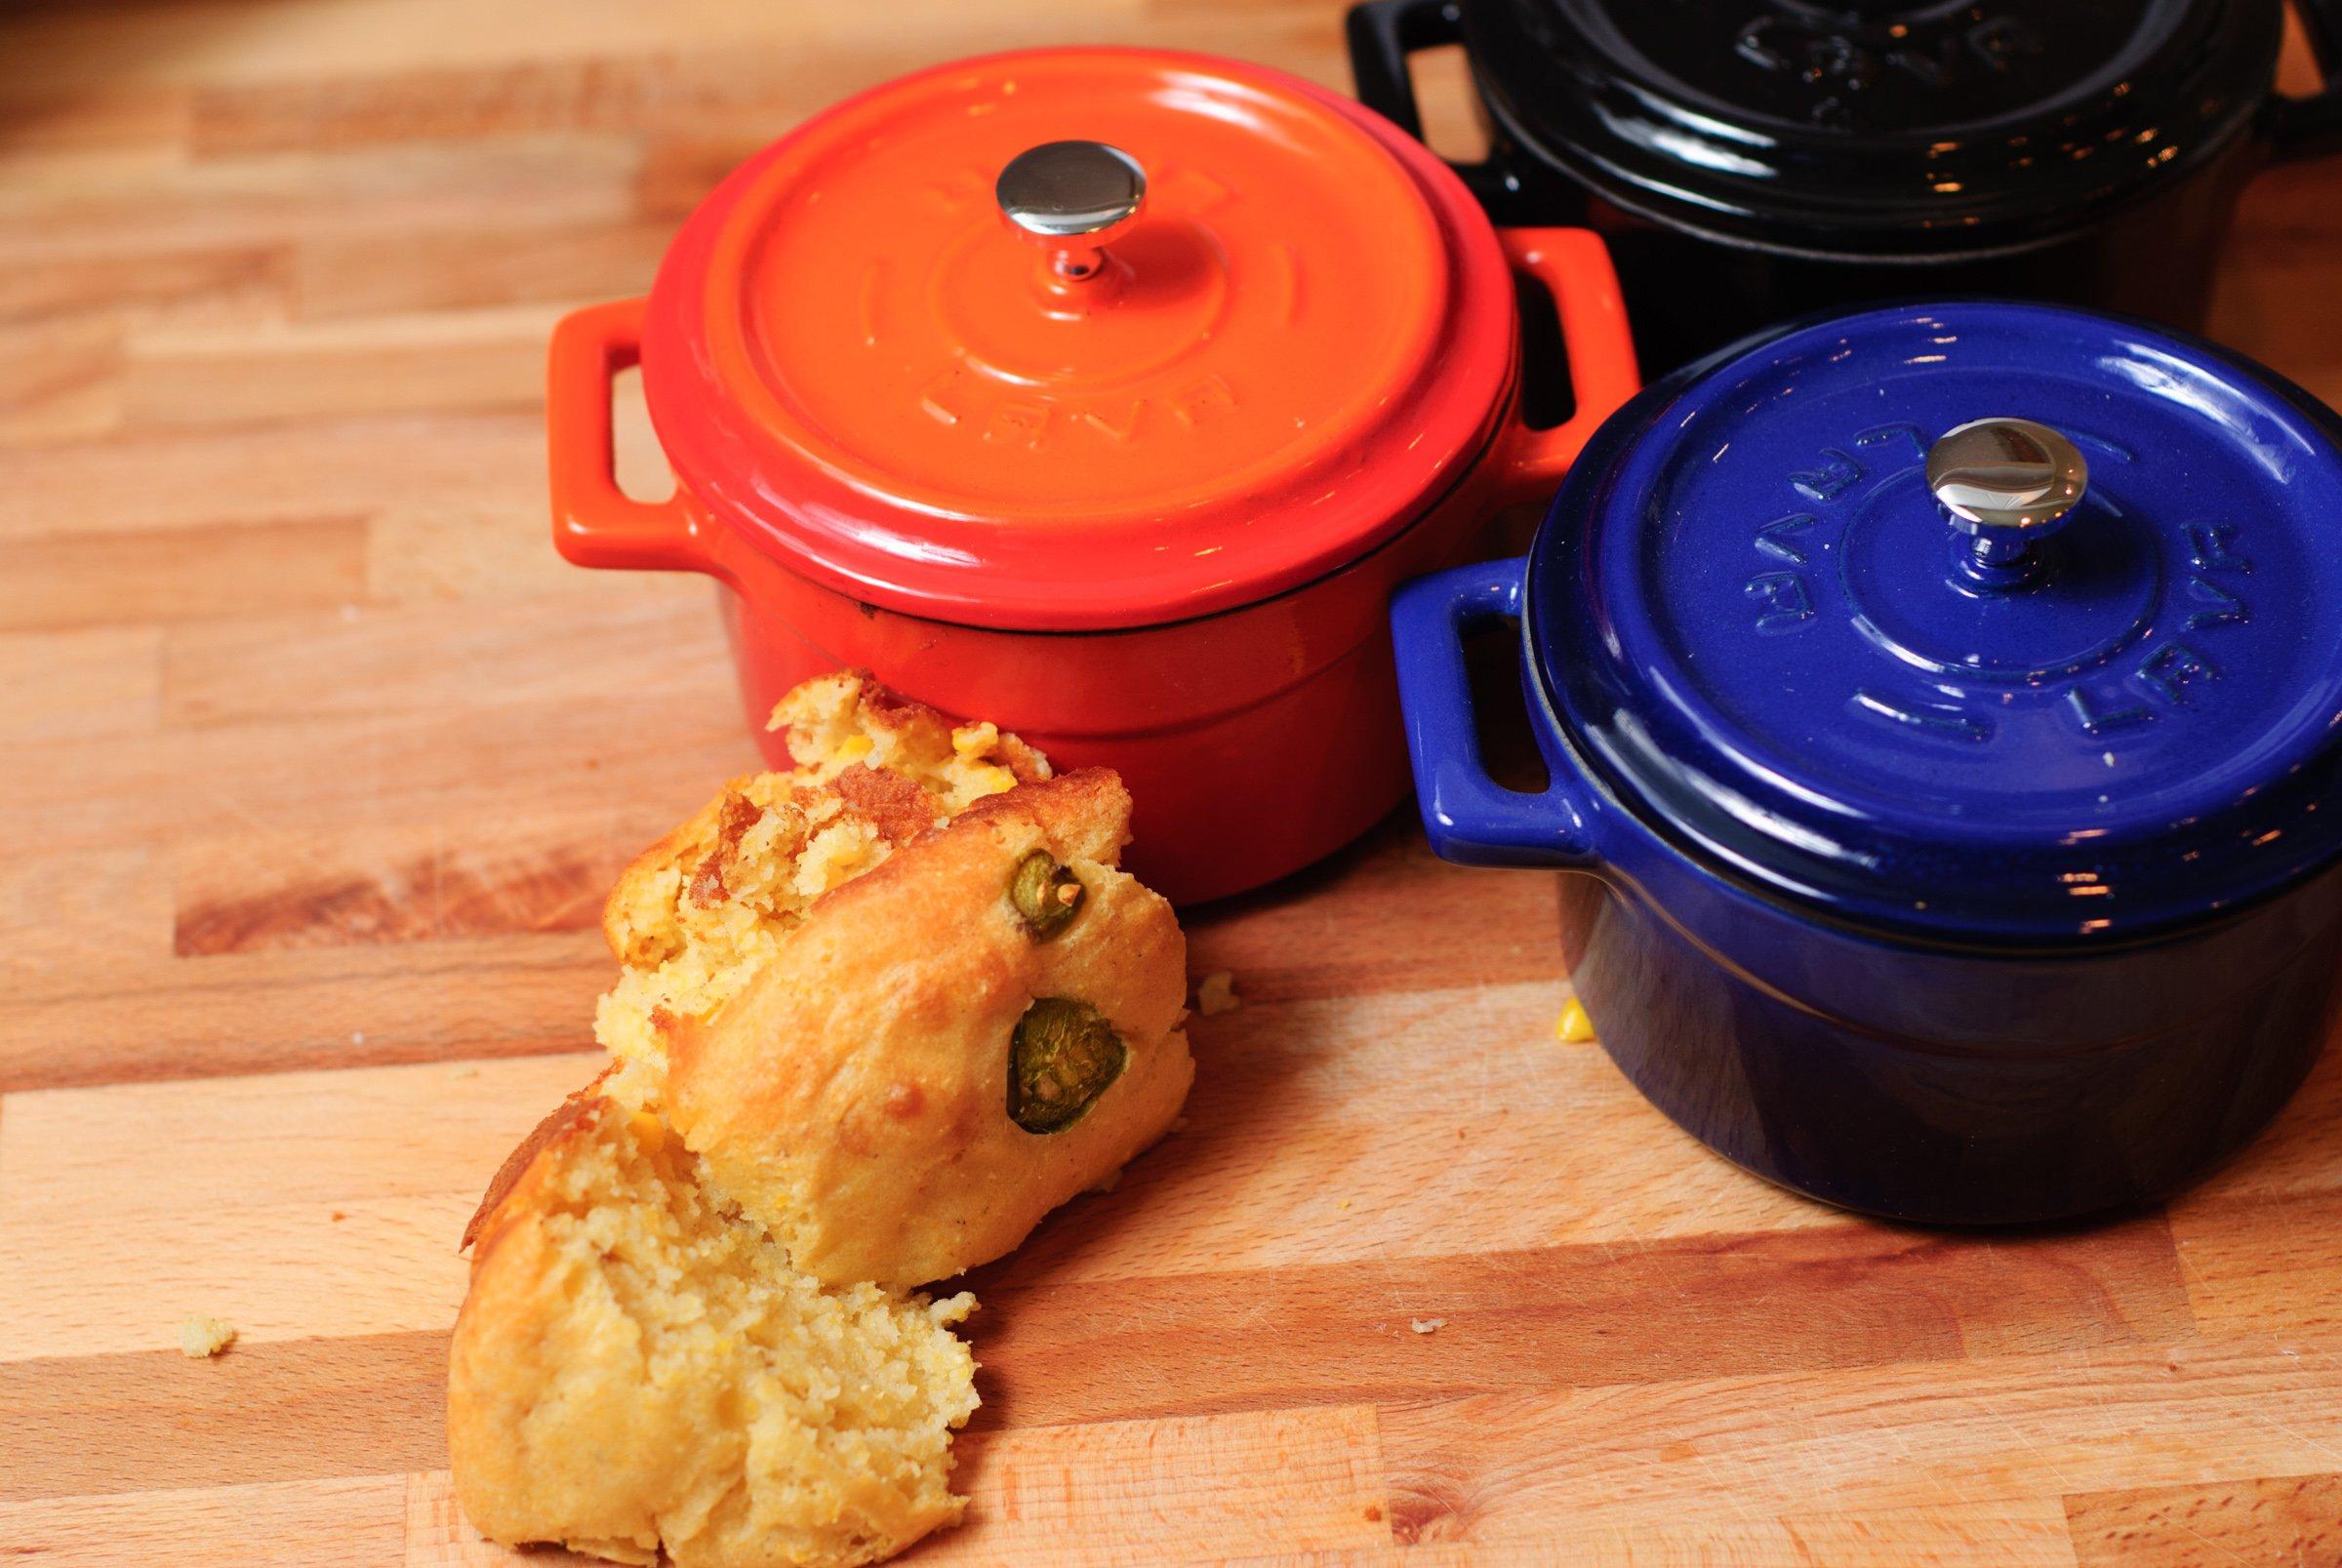 Lava Signature Enameled Cast-Iron Mini Dutch Oven - 12 ounce, Cobalt Blue by Lava Cookware (Image #3)